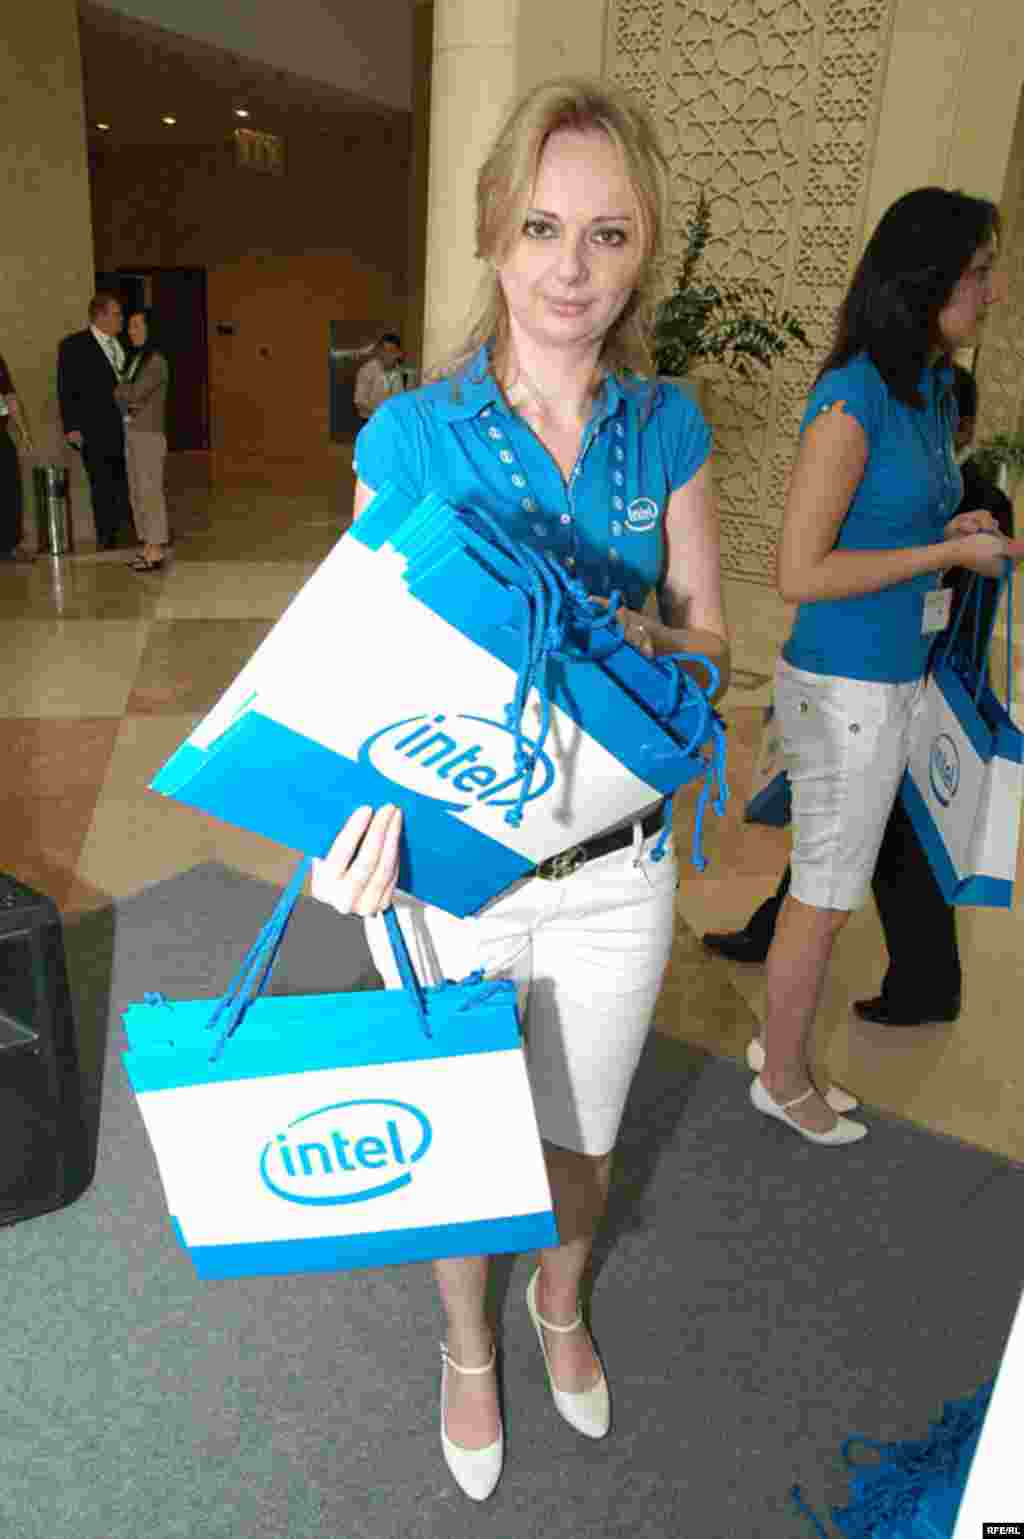 Intel نامی آشنا برای ایرانیان و البته تمامی کسانی که با کامپیوتر سر وکار دارند